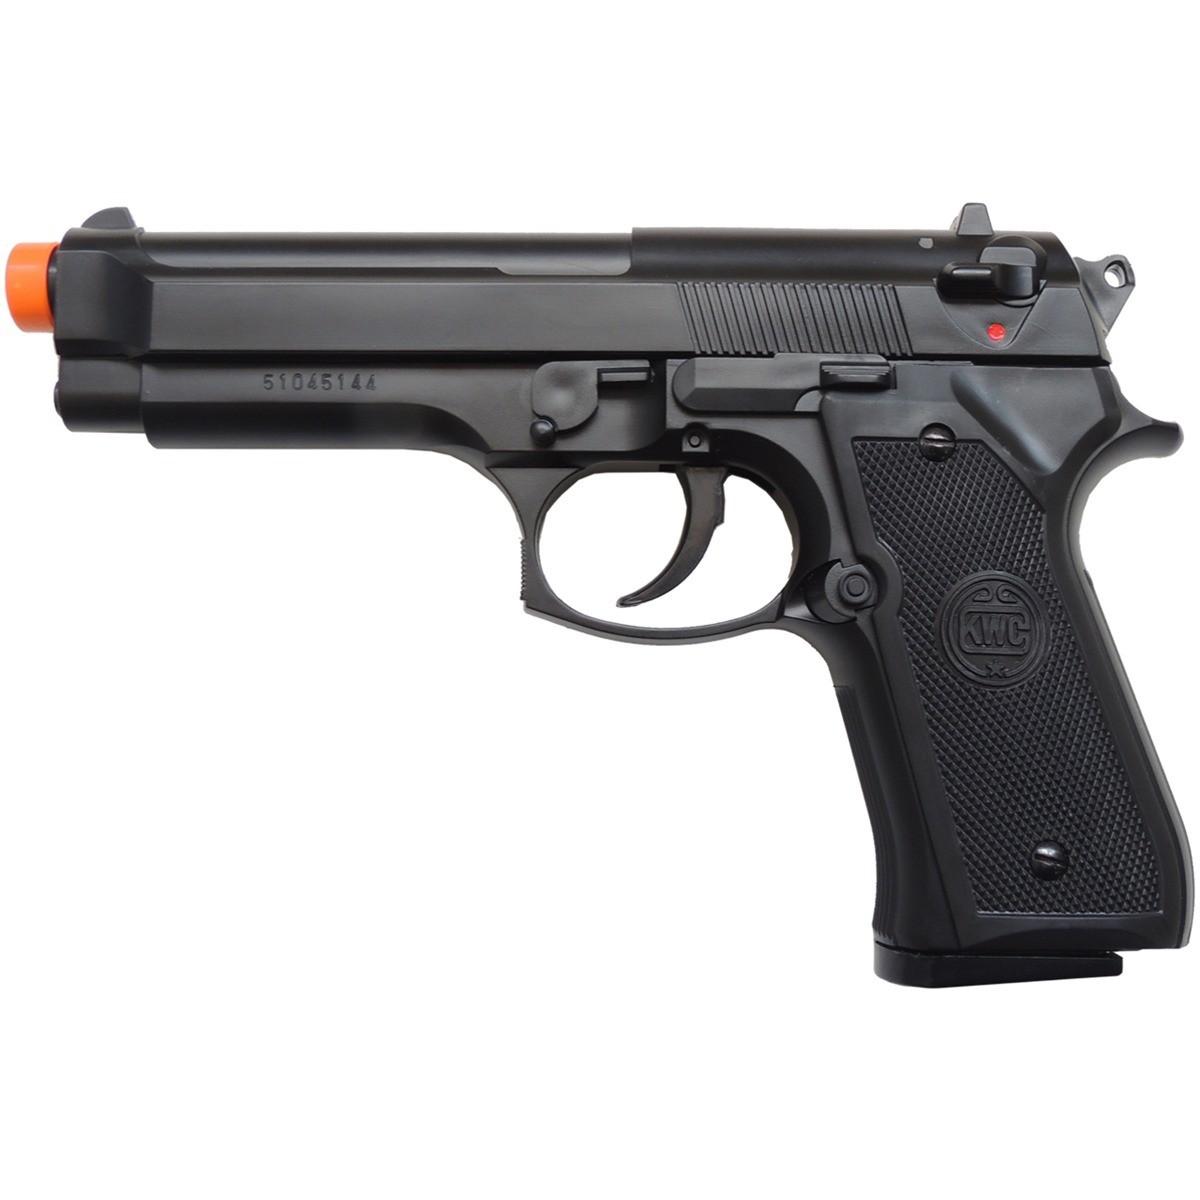 Pistola Airsoft Beretta M92 Black Spring 6mm KWC